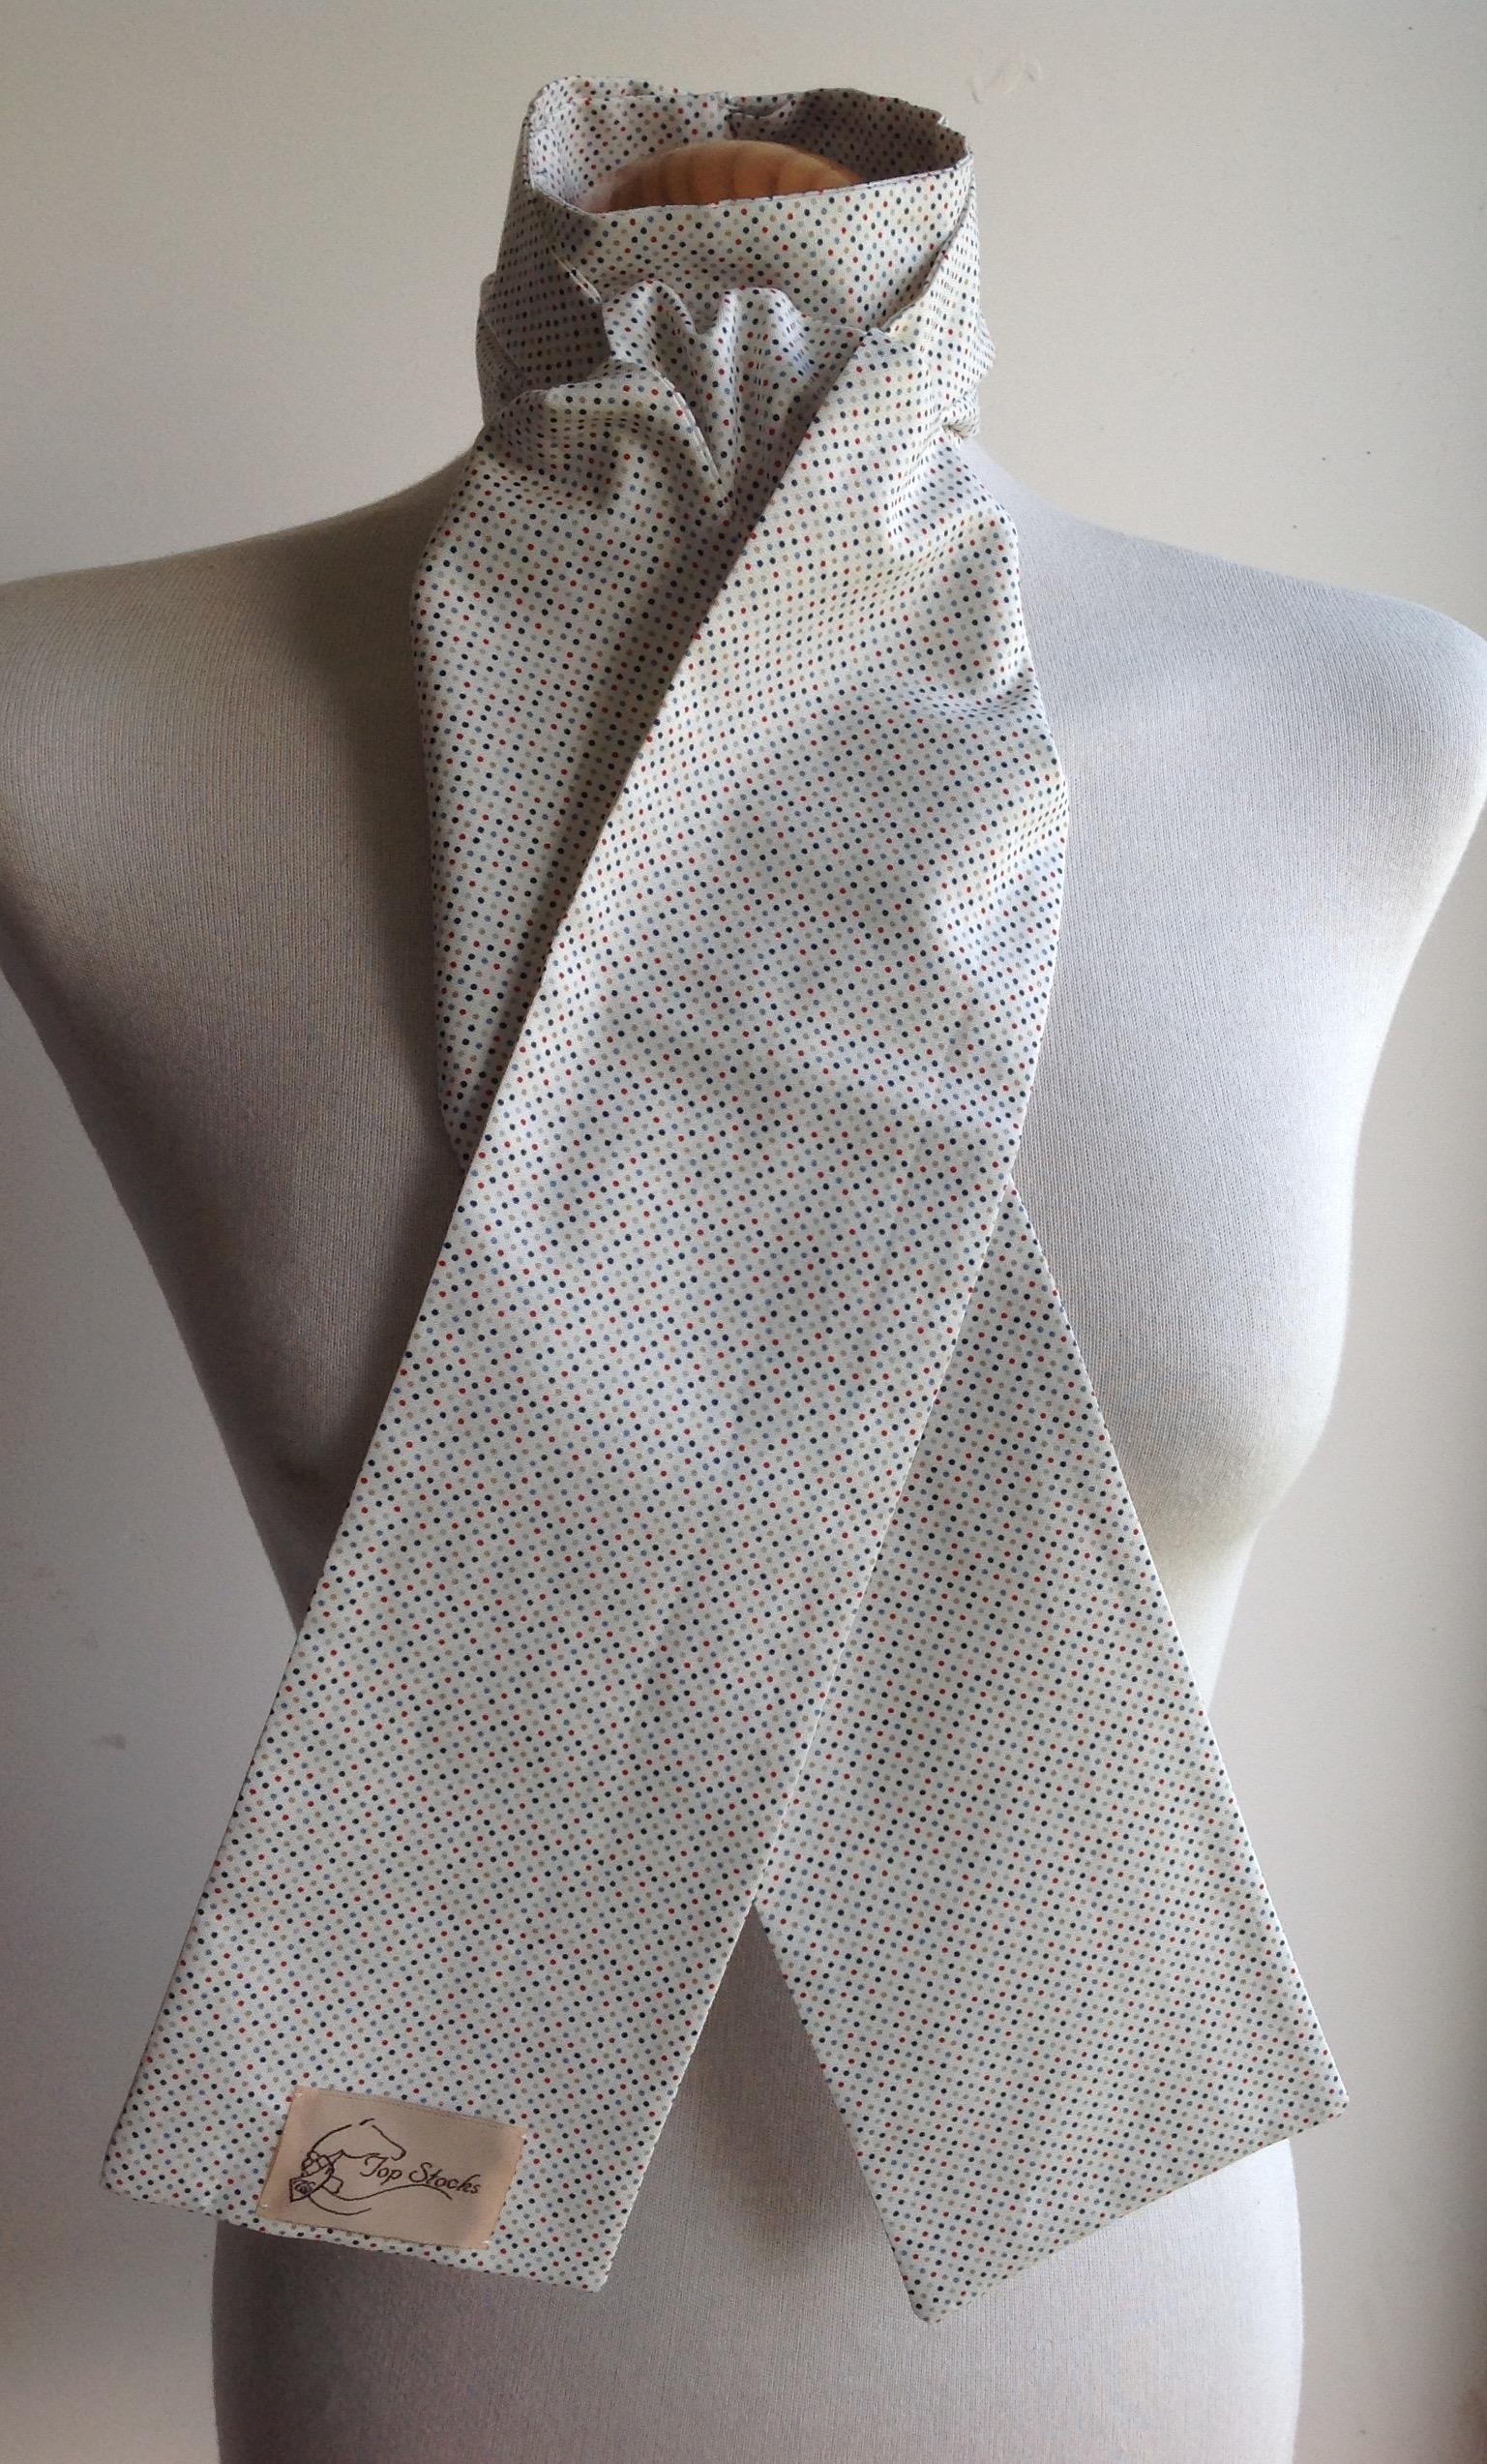 Shaped to tie 100% cotton stock - Ditsy multicolour polka dot